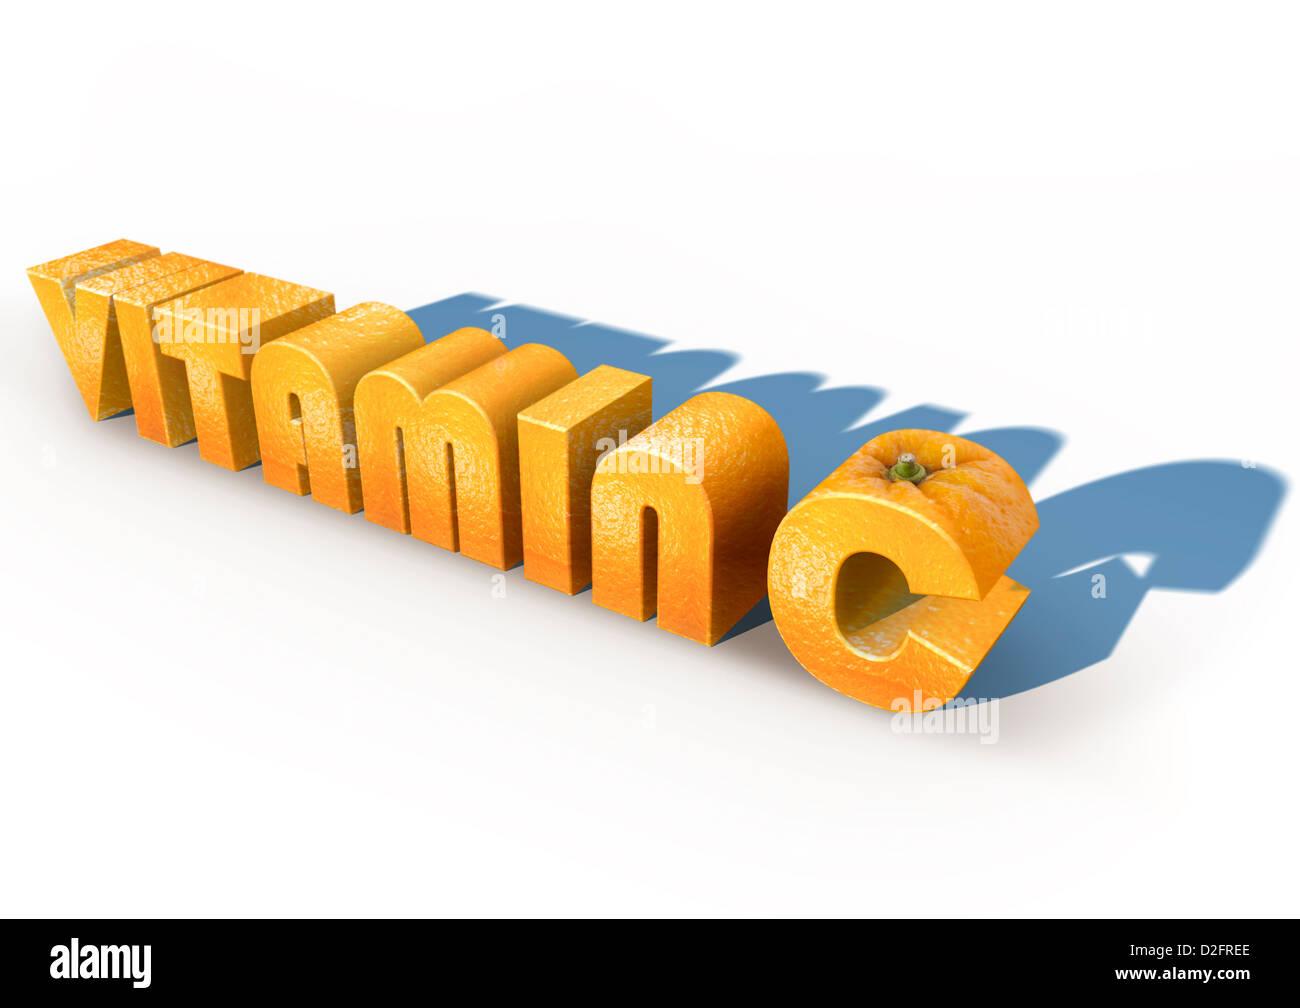 VITAMIN C textured with orange peel on white background. Concept image - Stock Image